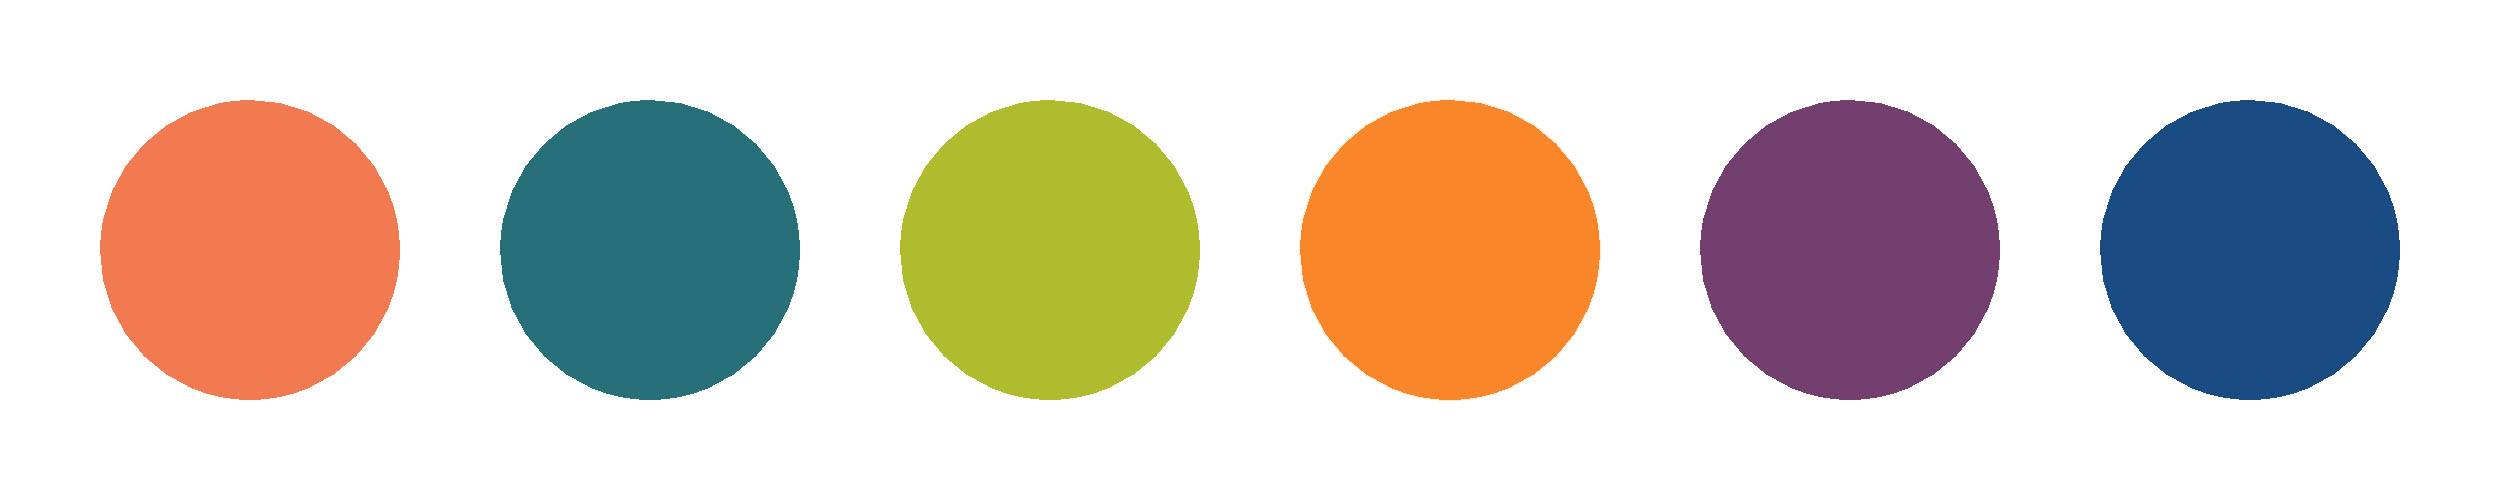 Color Trends Color Trends Reconnect Heimtextil Trends 20112012  Nidhi